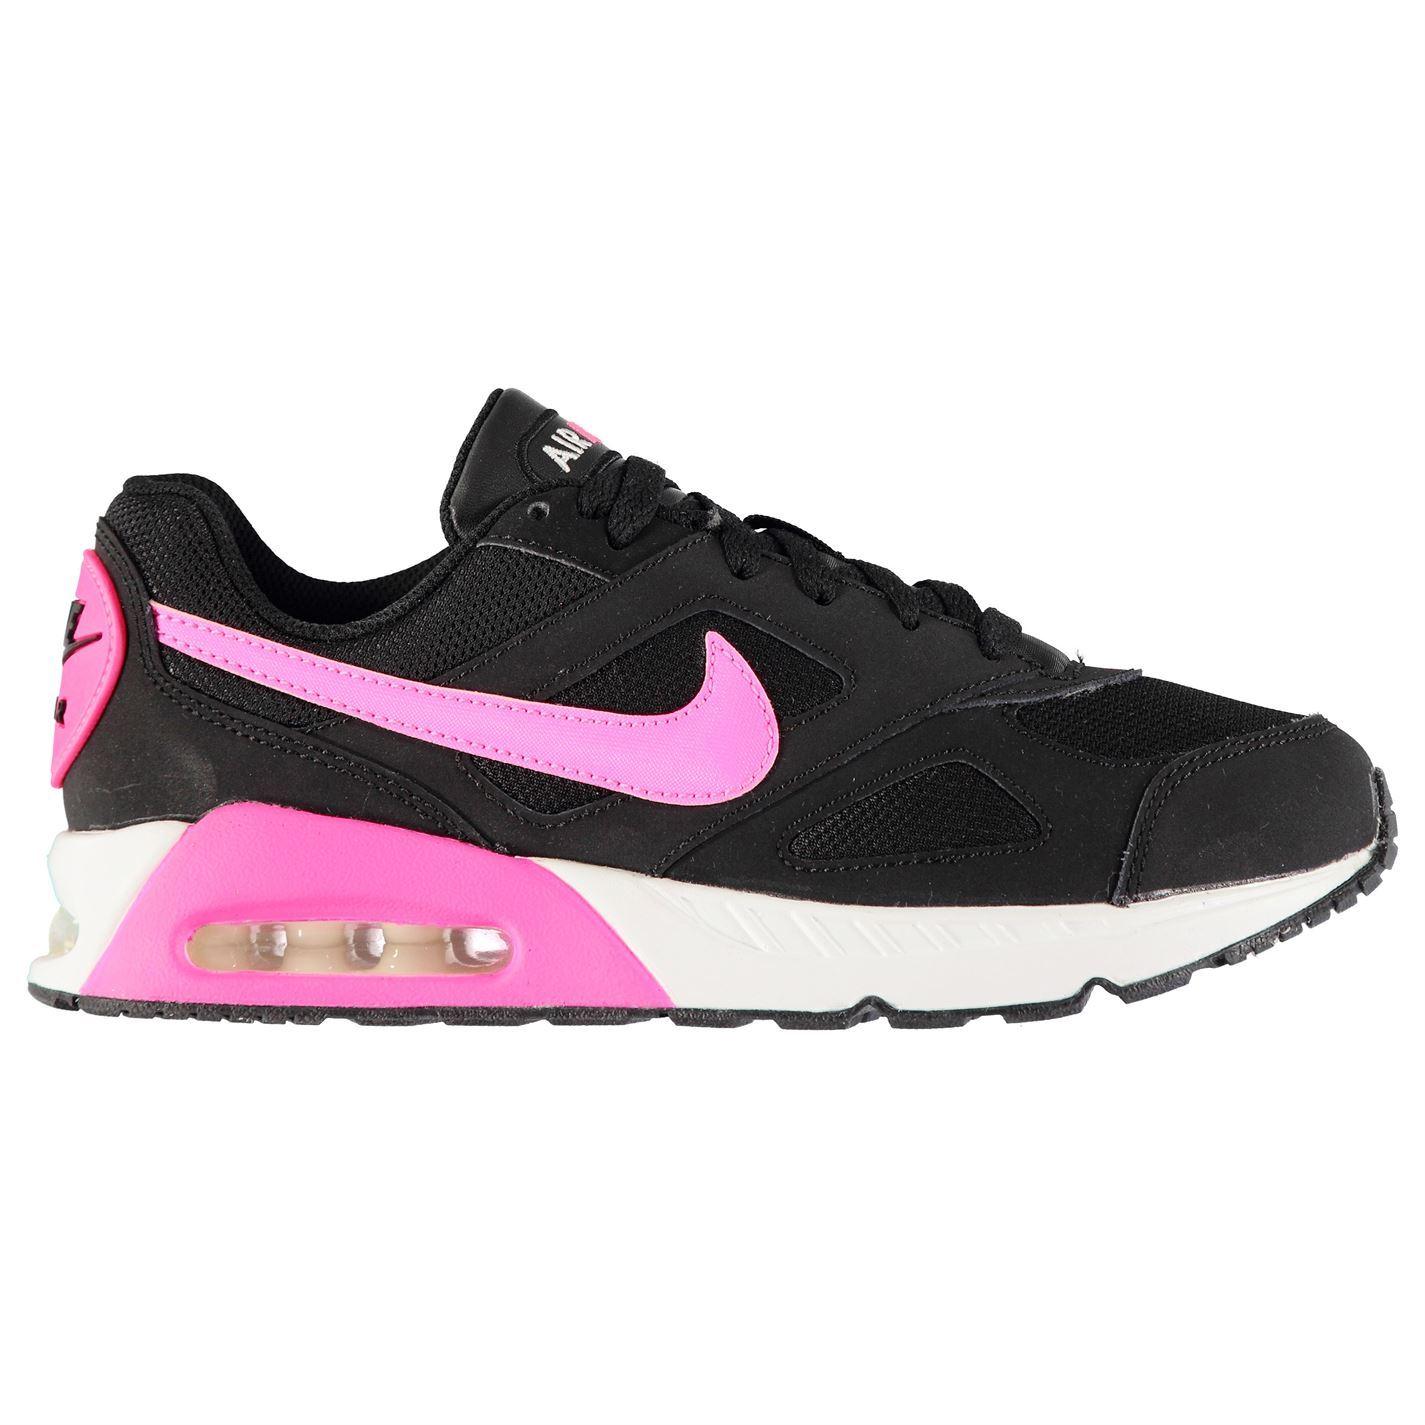 buy popular f6891 85011 Nike Air Max Ivo Girls Trainers Black Pink Shoes Footwear